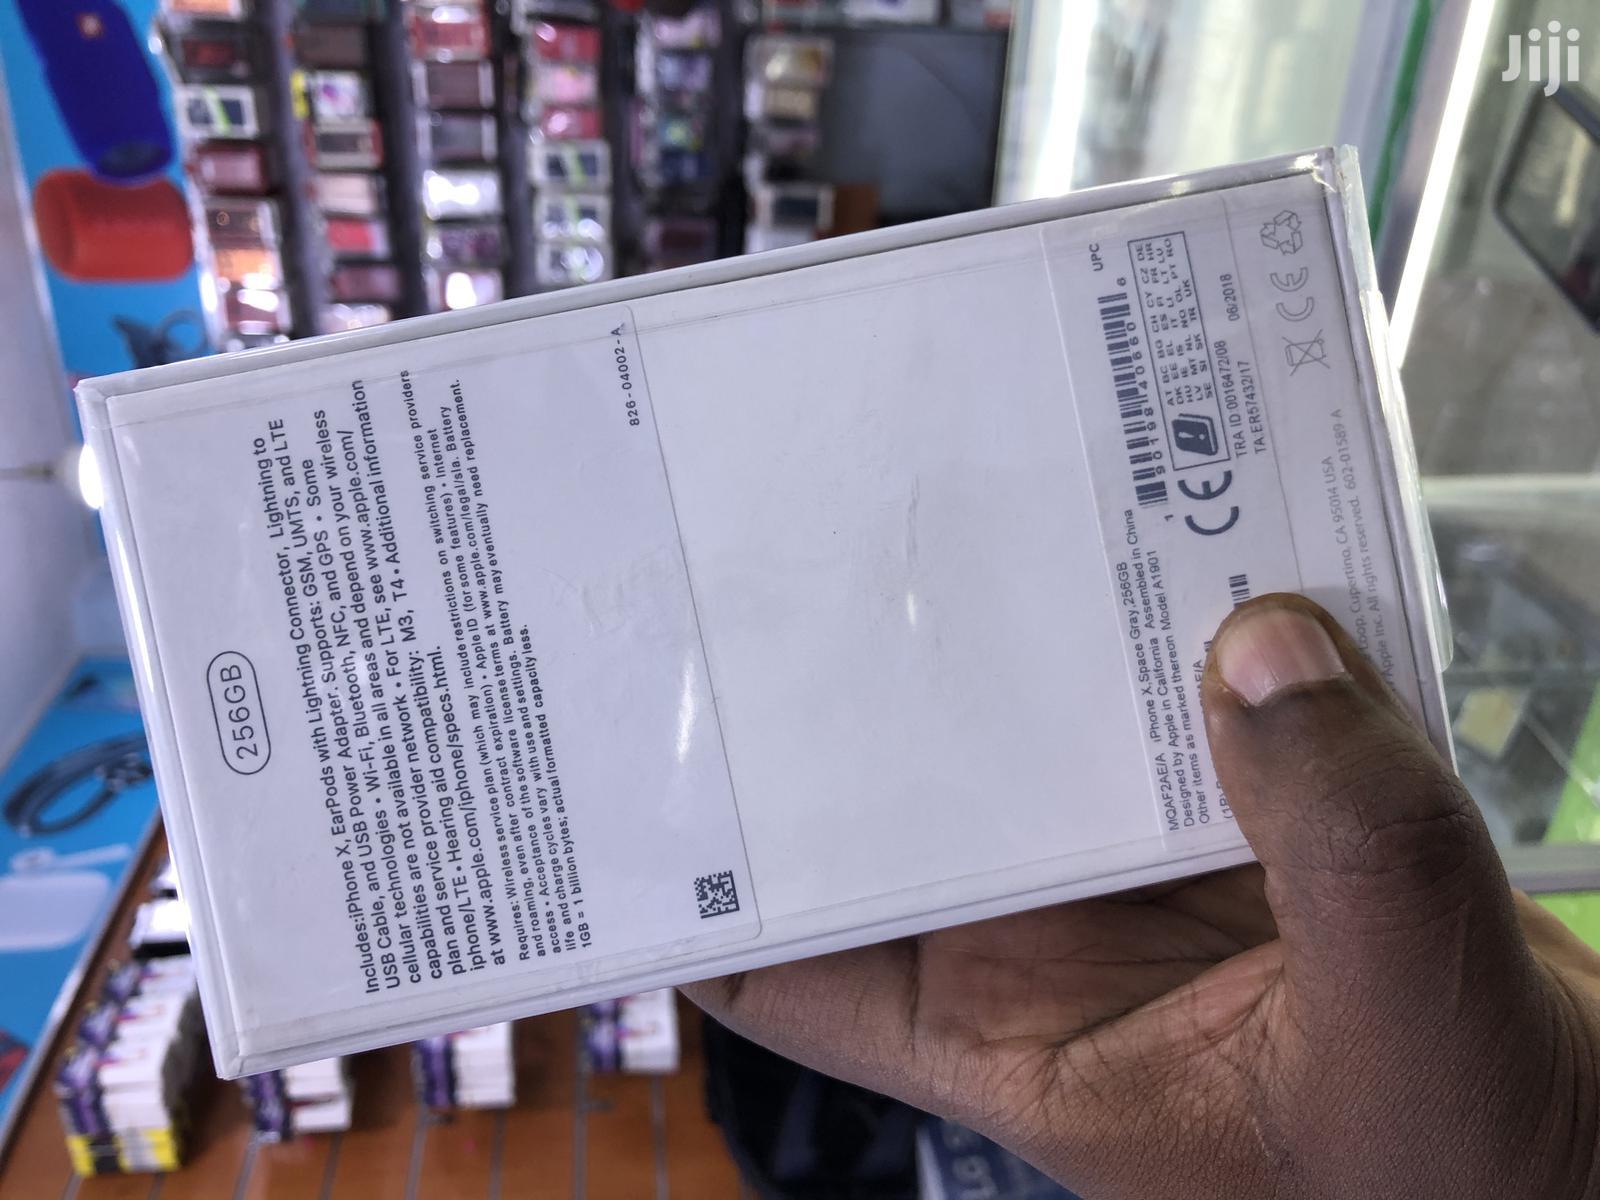 New Apple iPhone X 256 GB | Mobile Phones for sale in Kampala, Central Region, Uganda